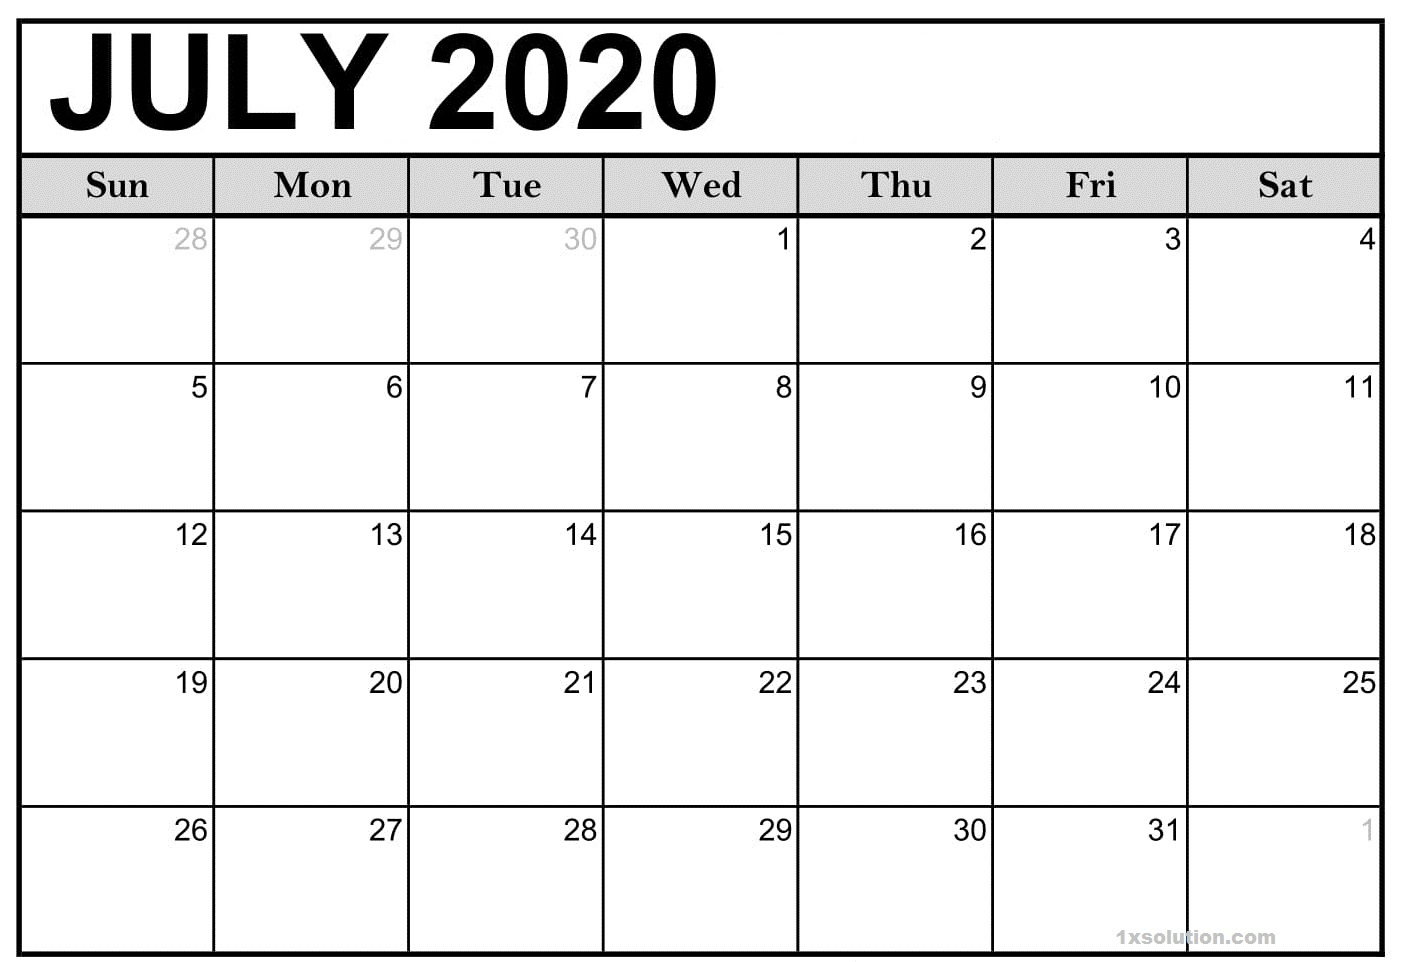 Free July 2020 Calendar Excel